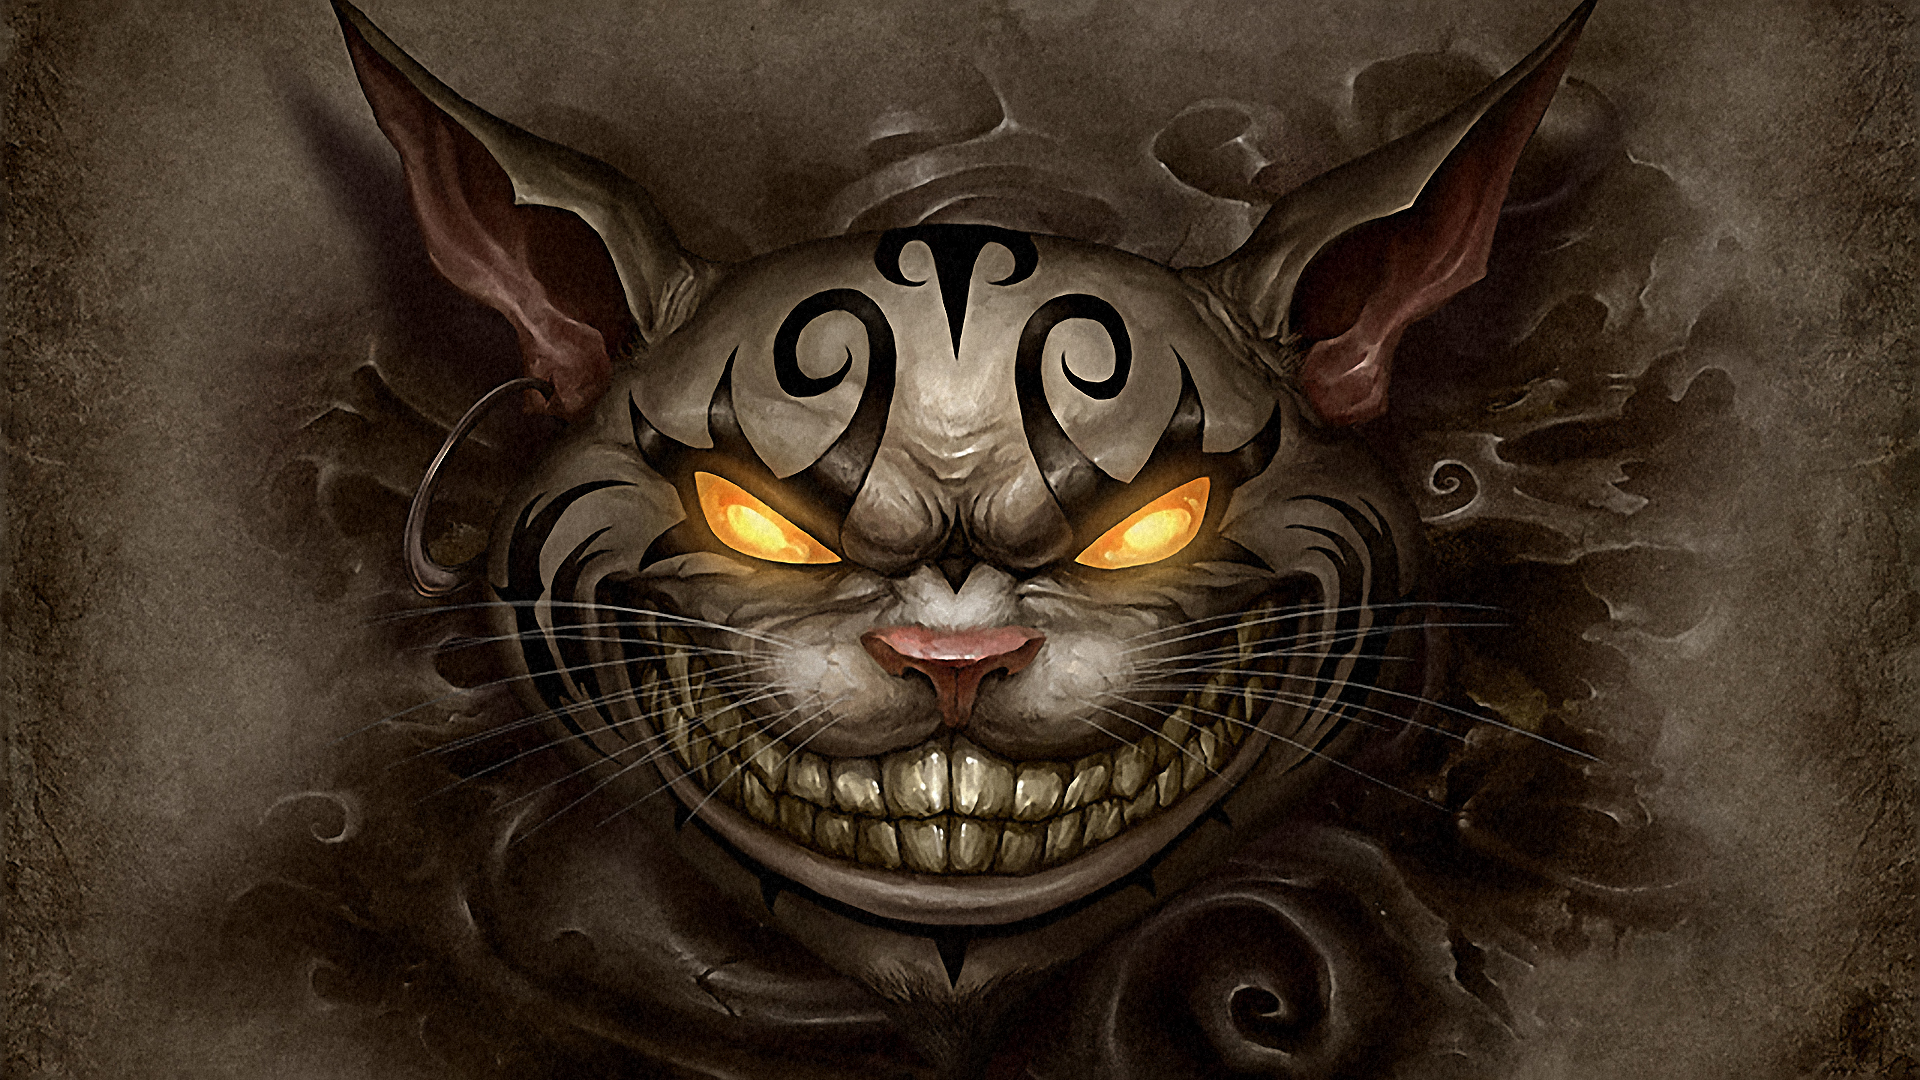 cats cheshire cat desktop wallpaper download cats cheshire cat 1920x1080